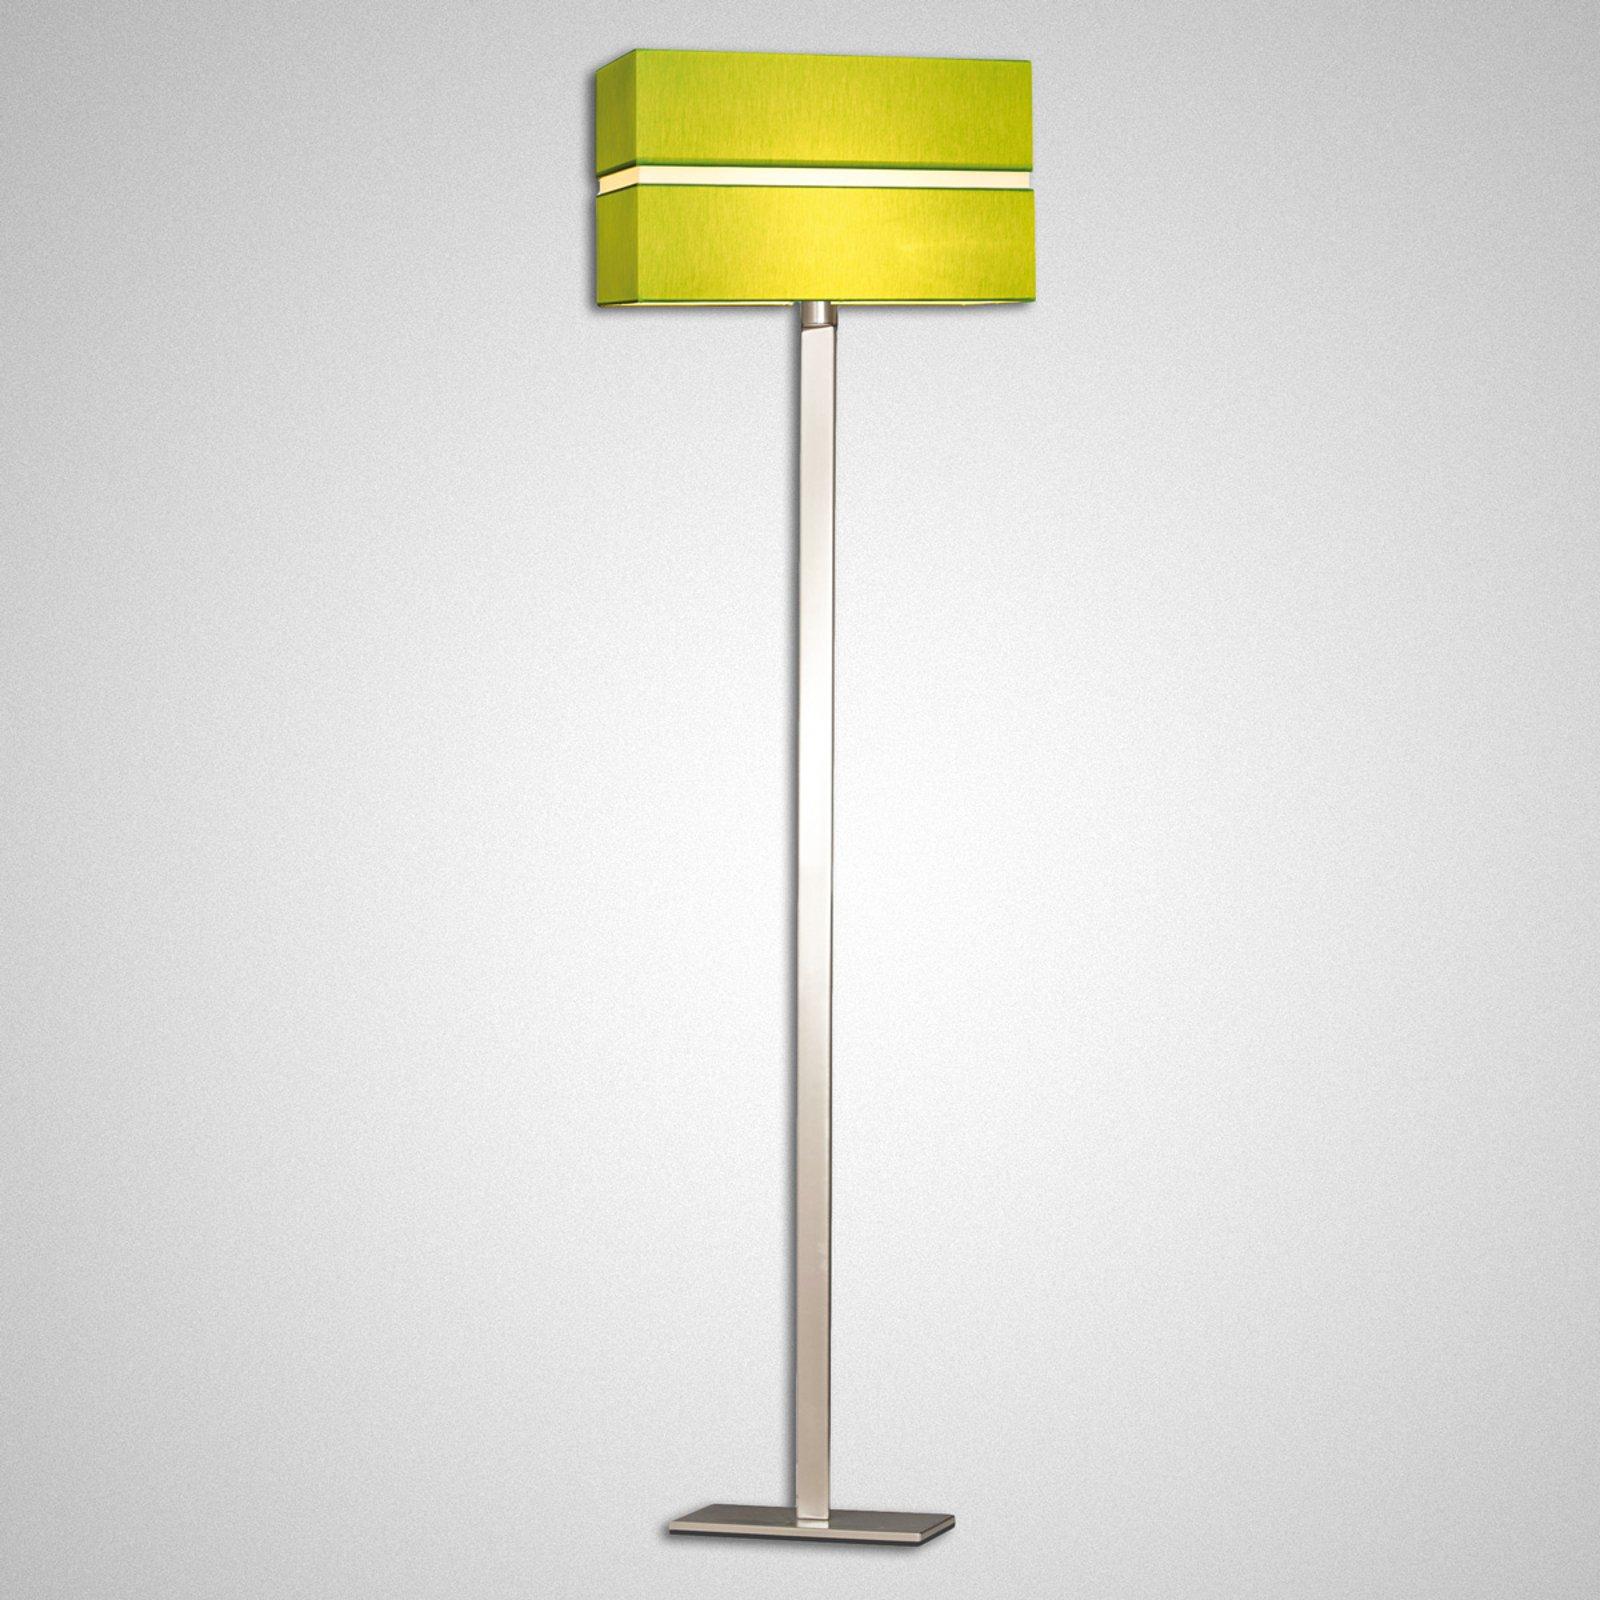 Tekstilgulvlampe Nimbo i aktuelt design